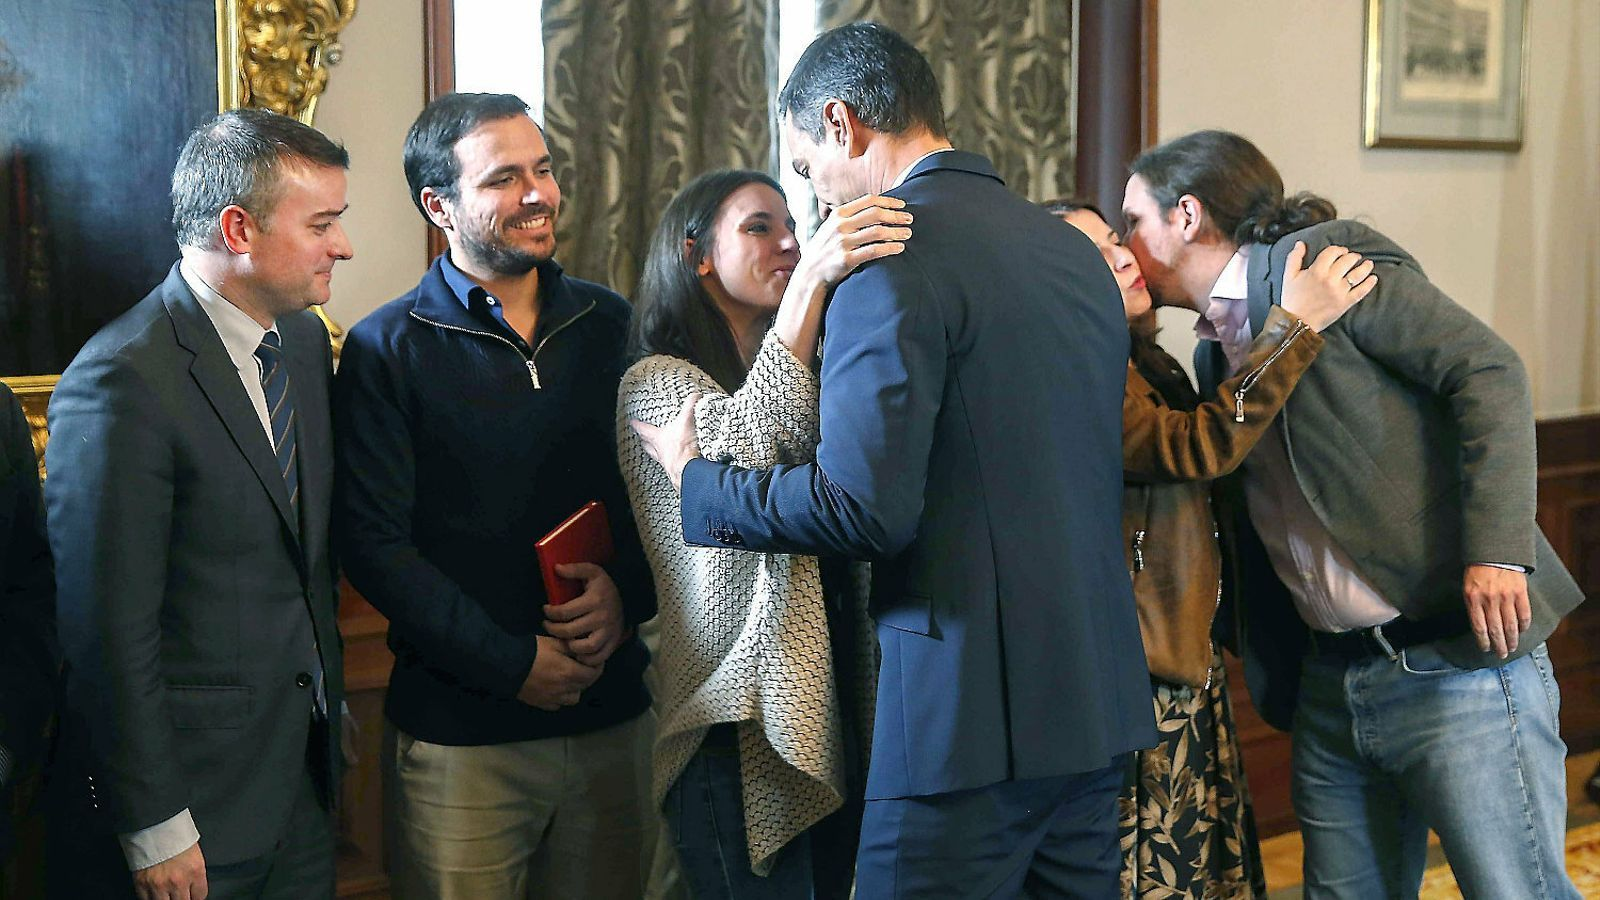 Irene Montero i Pedro Sánchez saludant-se dimarts en la signatura de l'acord de govern.